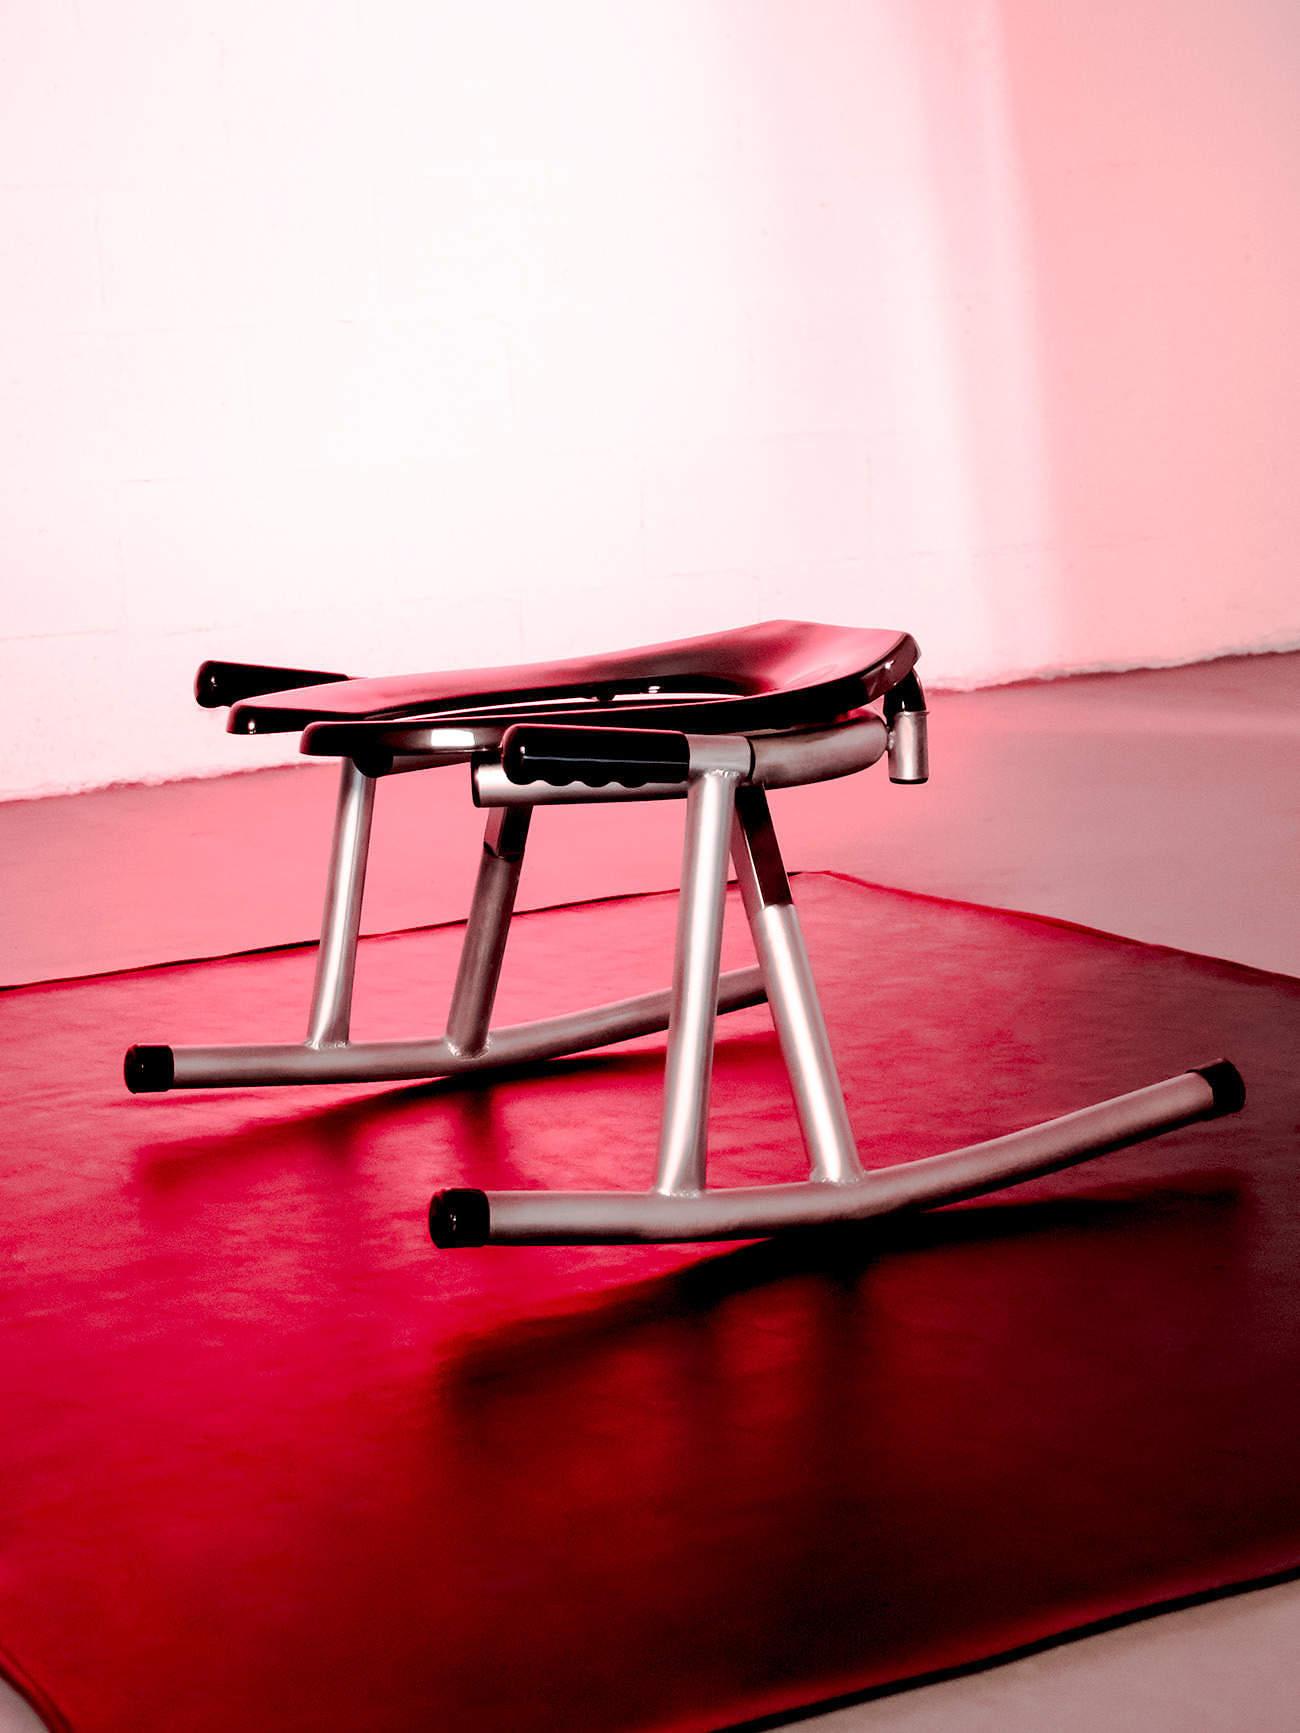 JimSupport Rim Rocker Rim Seat, Side View